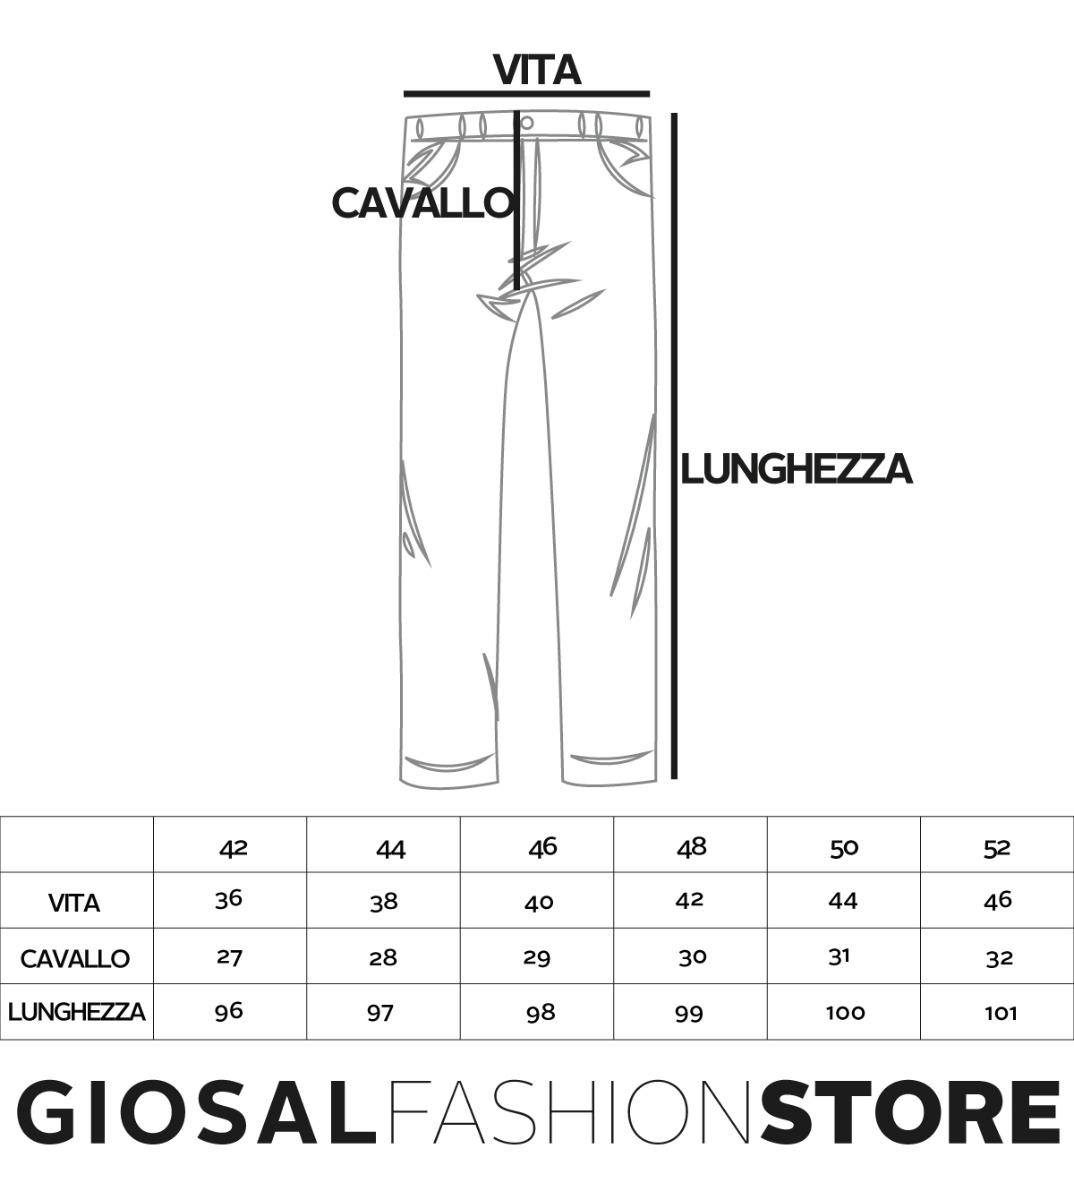 Pantalone-Uomo-Cargo-Tasca-America-Kaki-Tinta-Unita-Cotone-Casual-GIOSAL miniatura 8